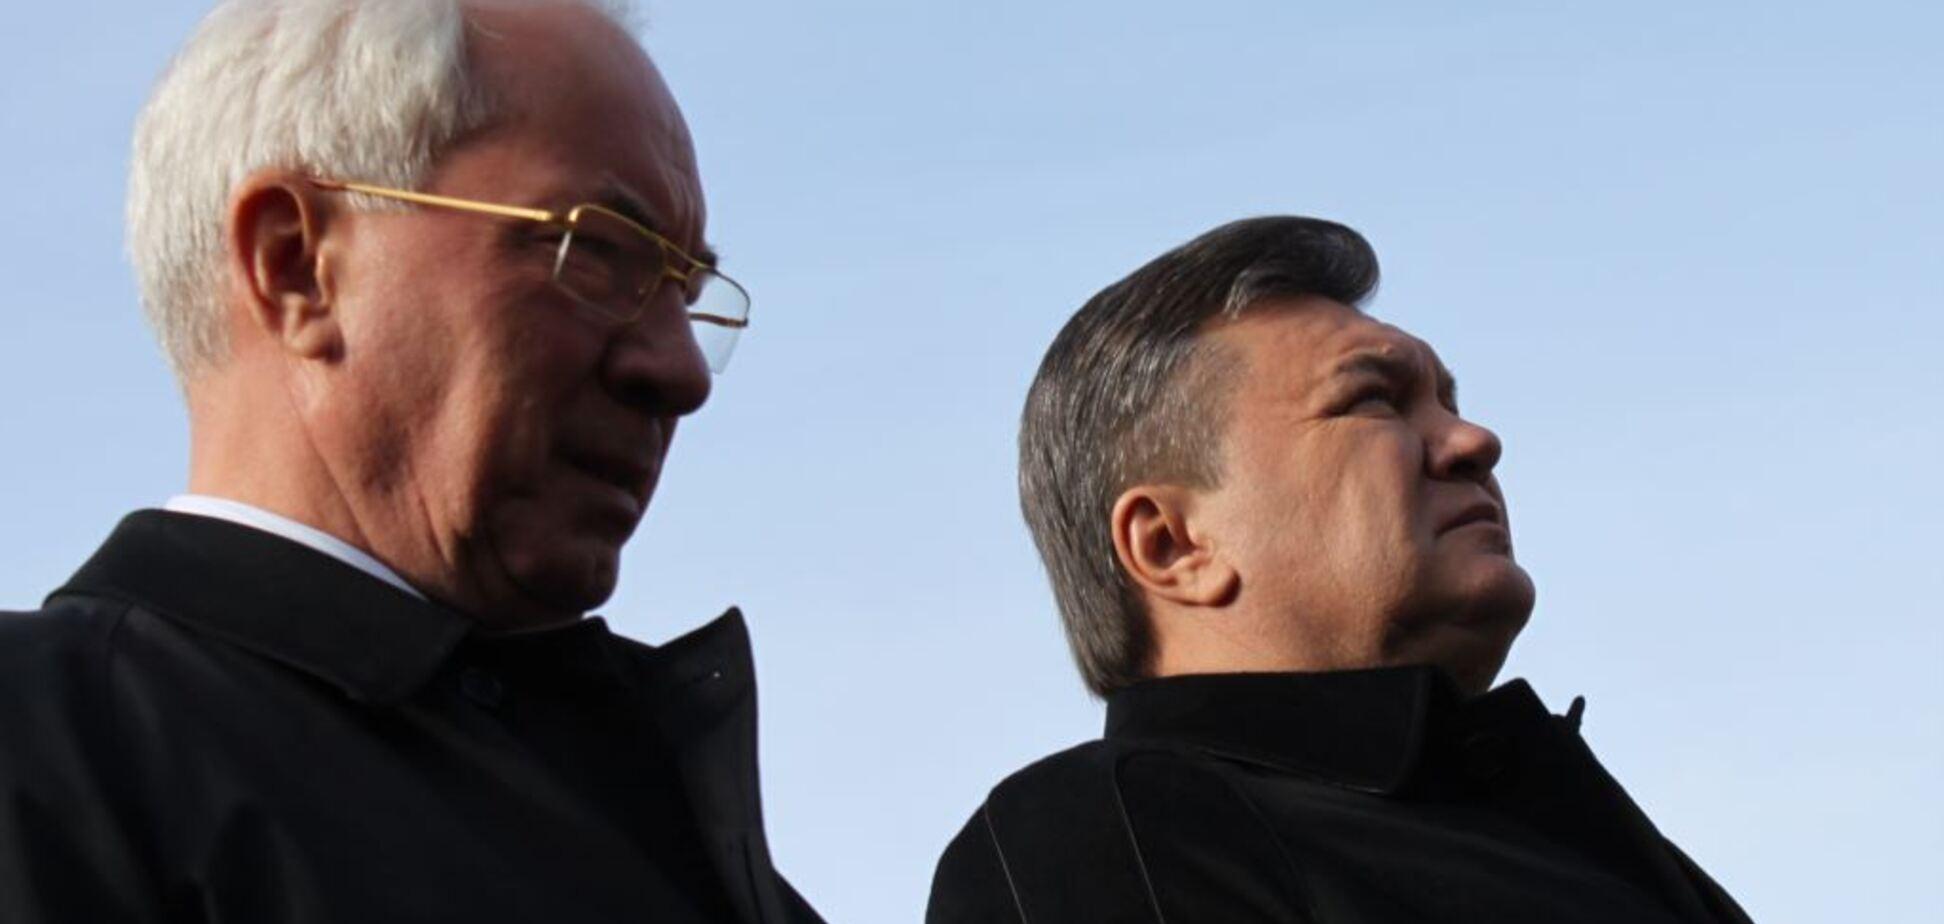 Янукович и Азаров возглавят 'ДНР'? Бутусов оценил перспективу